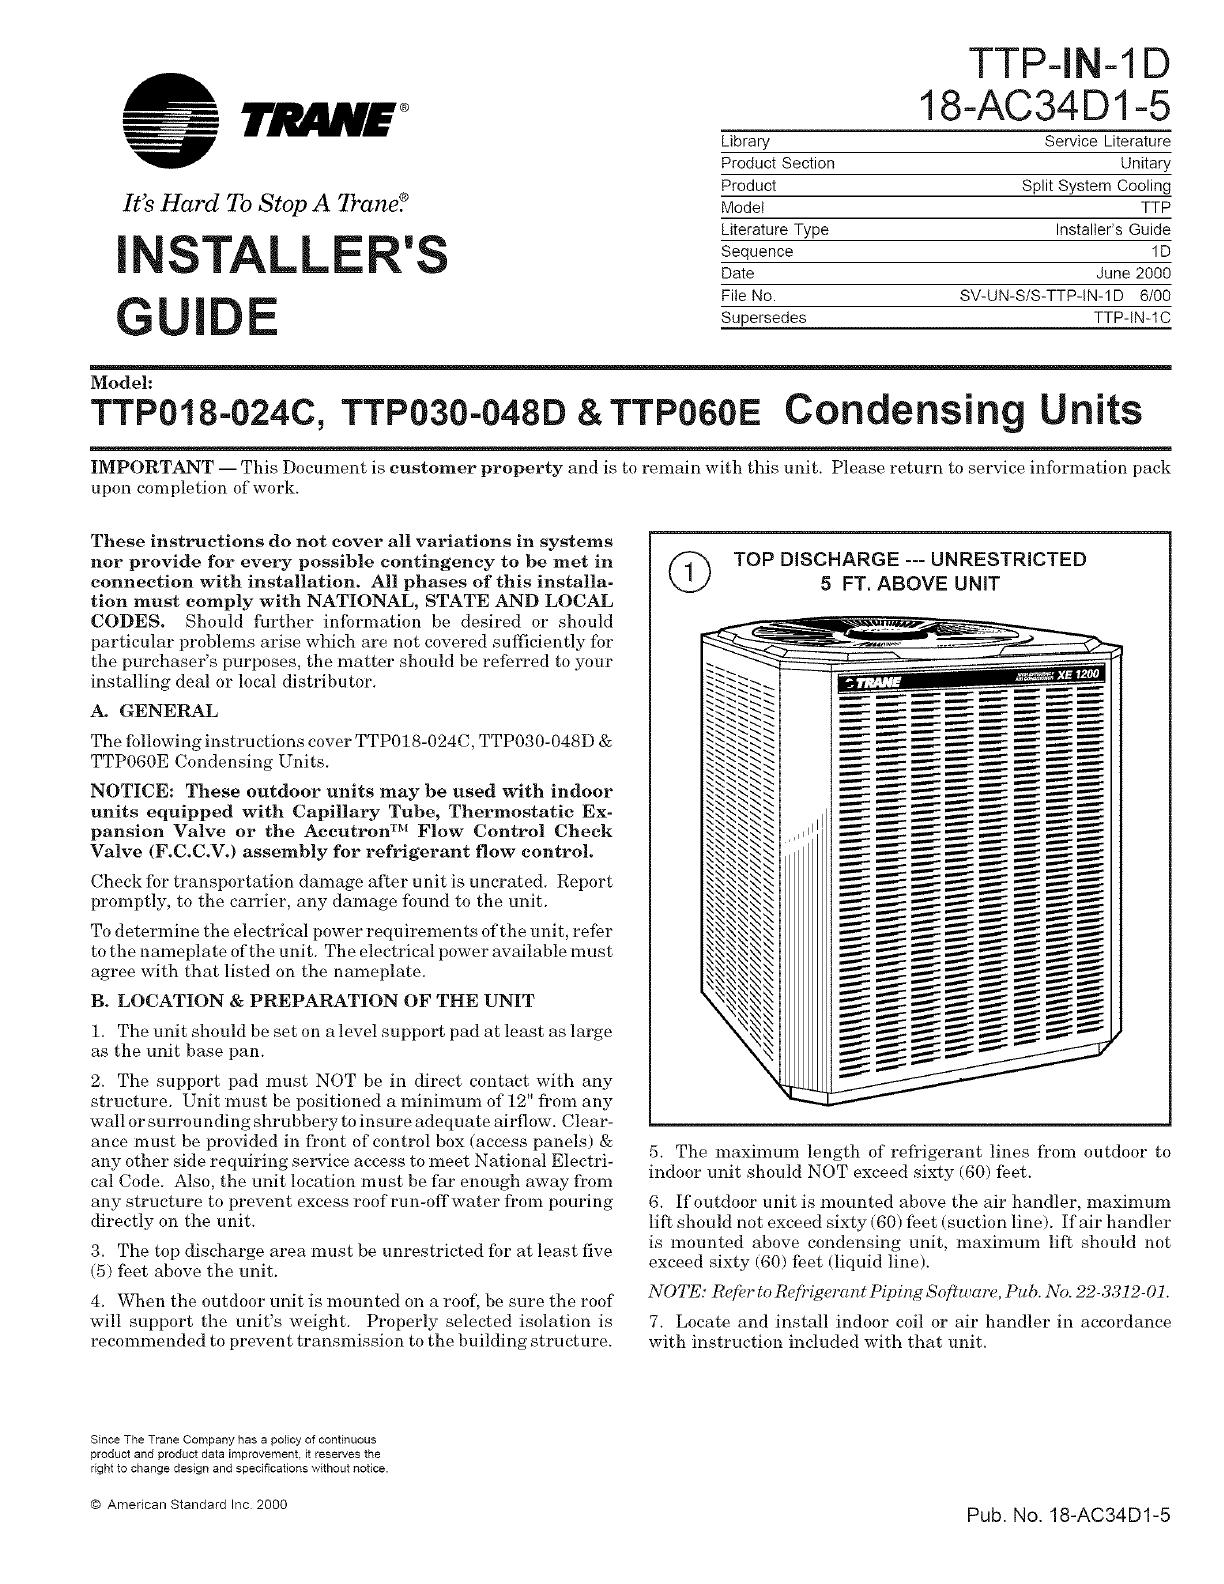 trane air conditioner heat pump outside unit manual l0801741 rh usermanual wiki Trane Service Manel Mechanical Contractor Servicing Trane